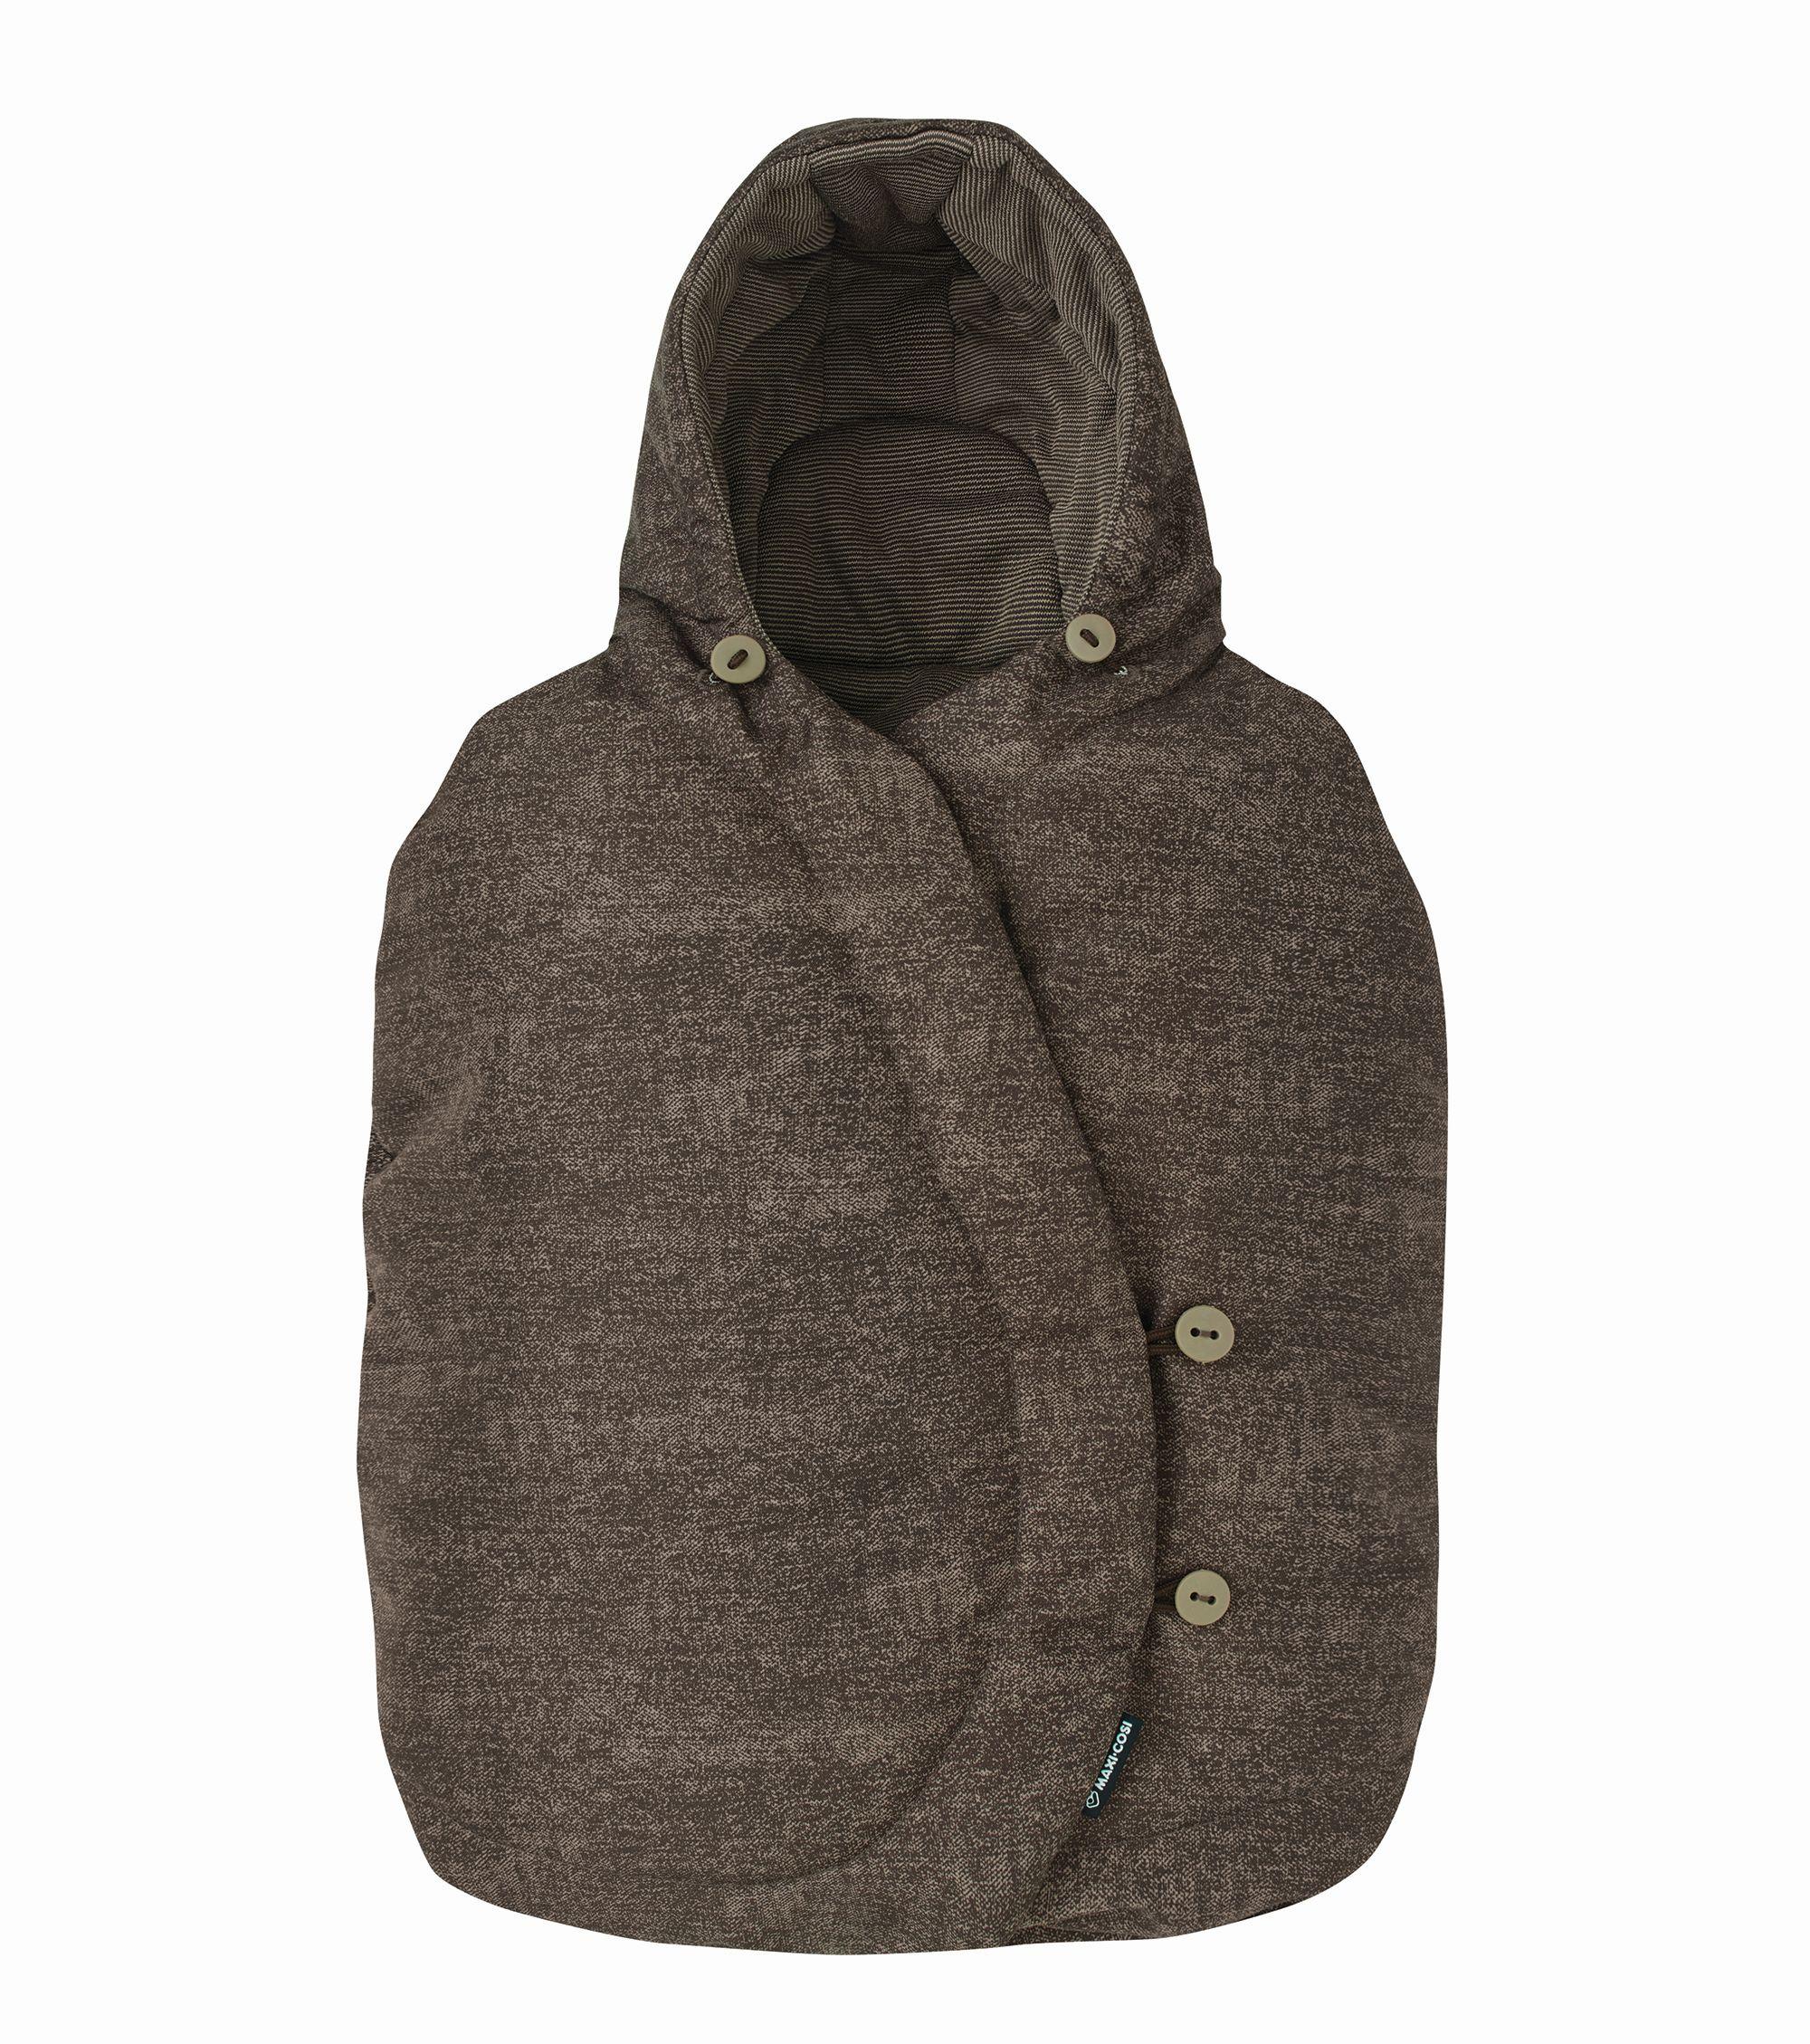 maxi cosi footmuff for infant car seat pebble 2018 nomad. Black Bedroom Furniture Sets. Home Design Ideas